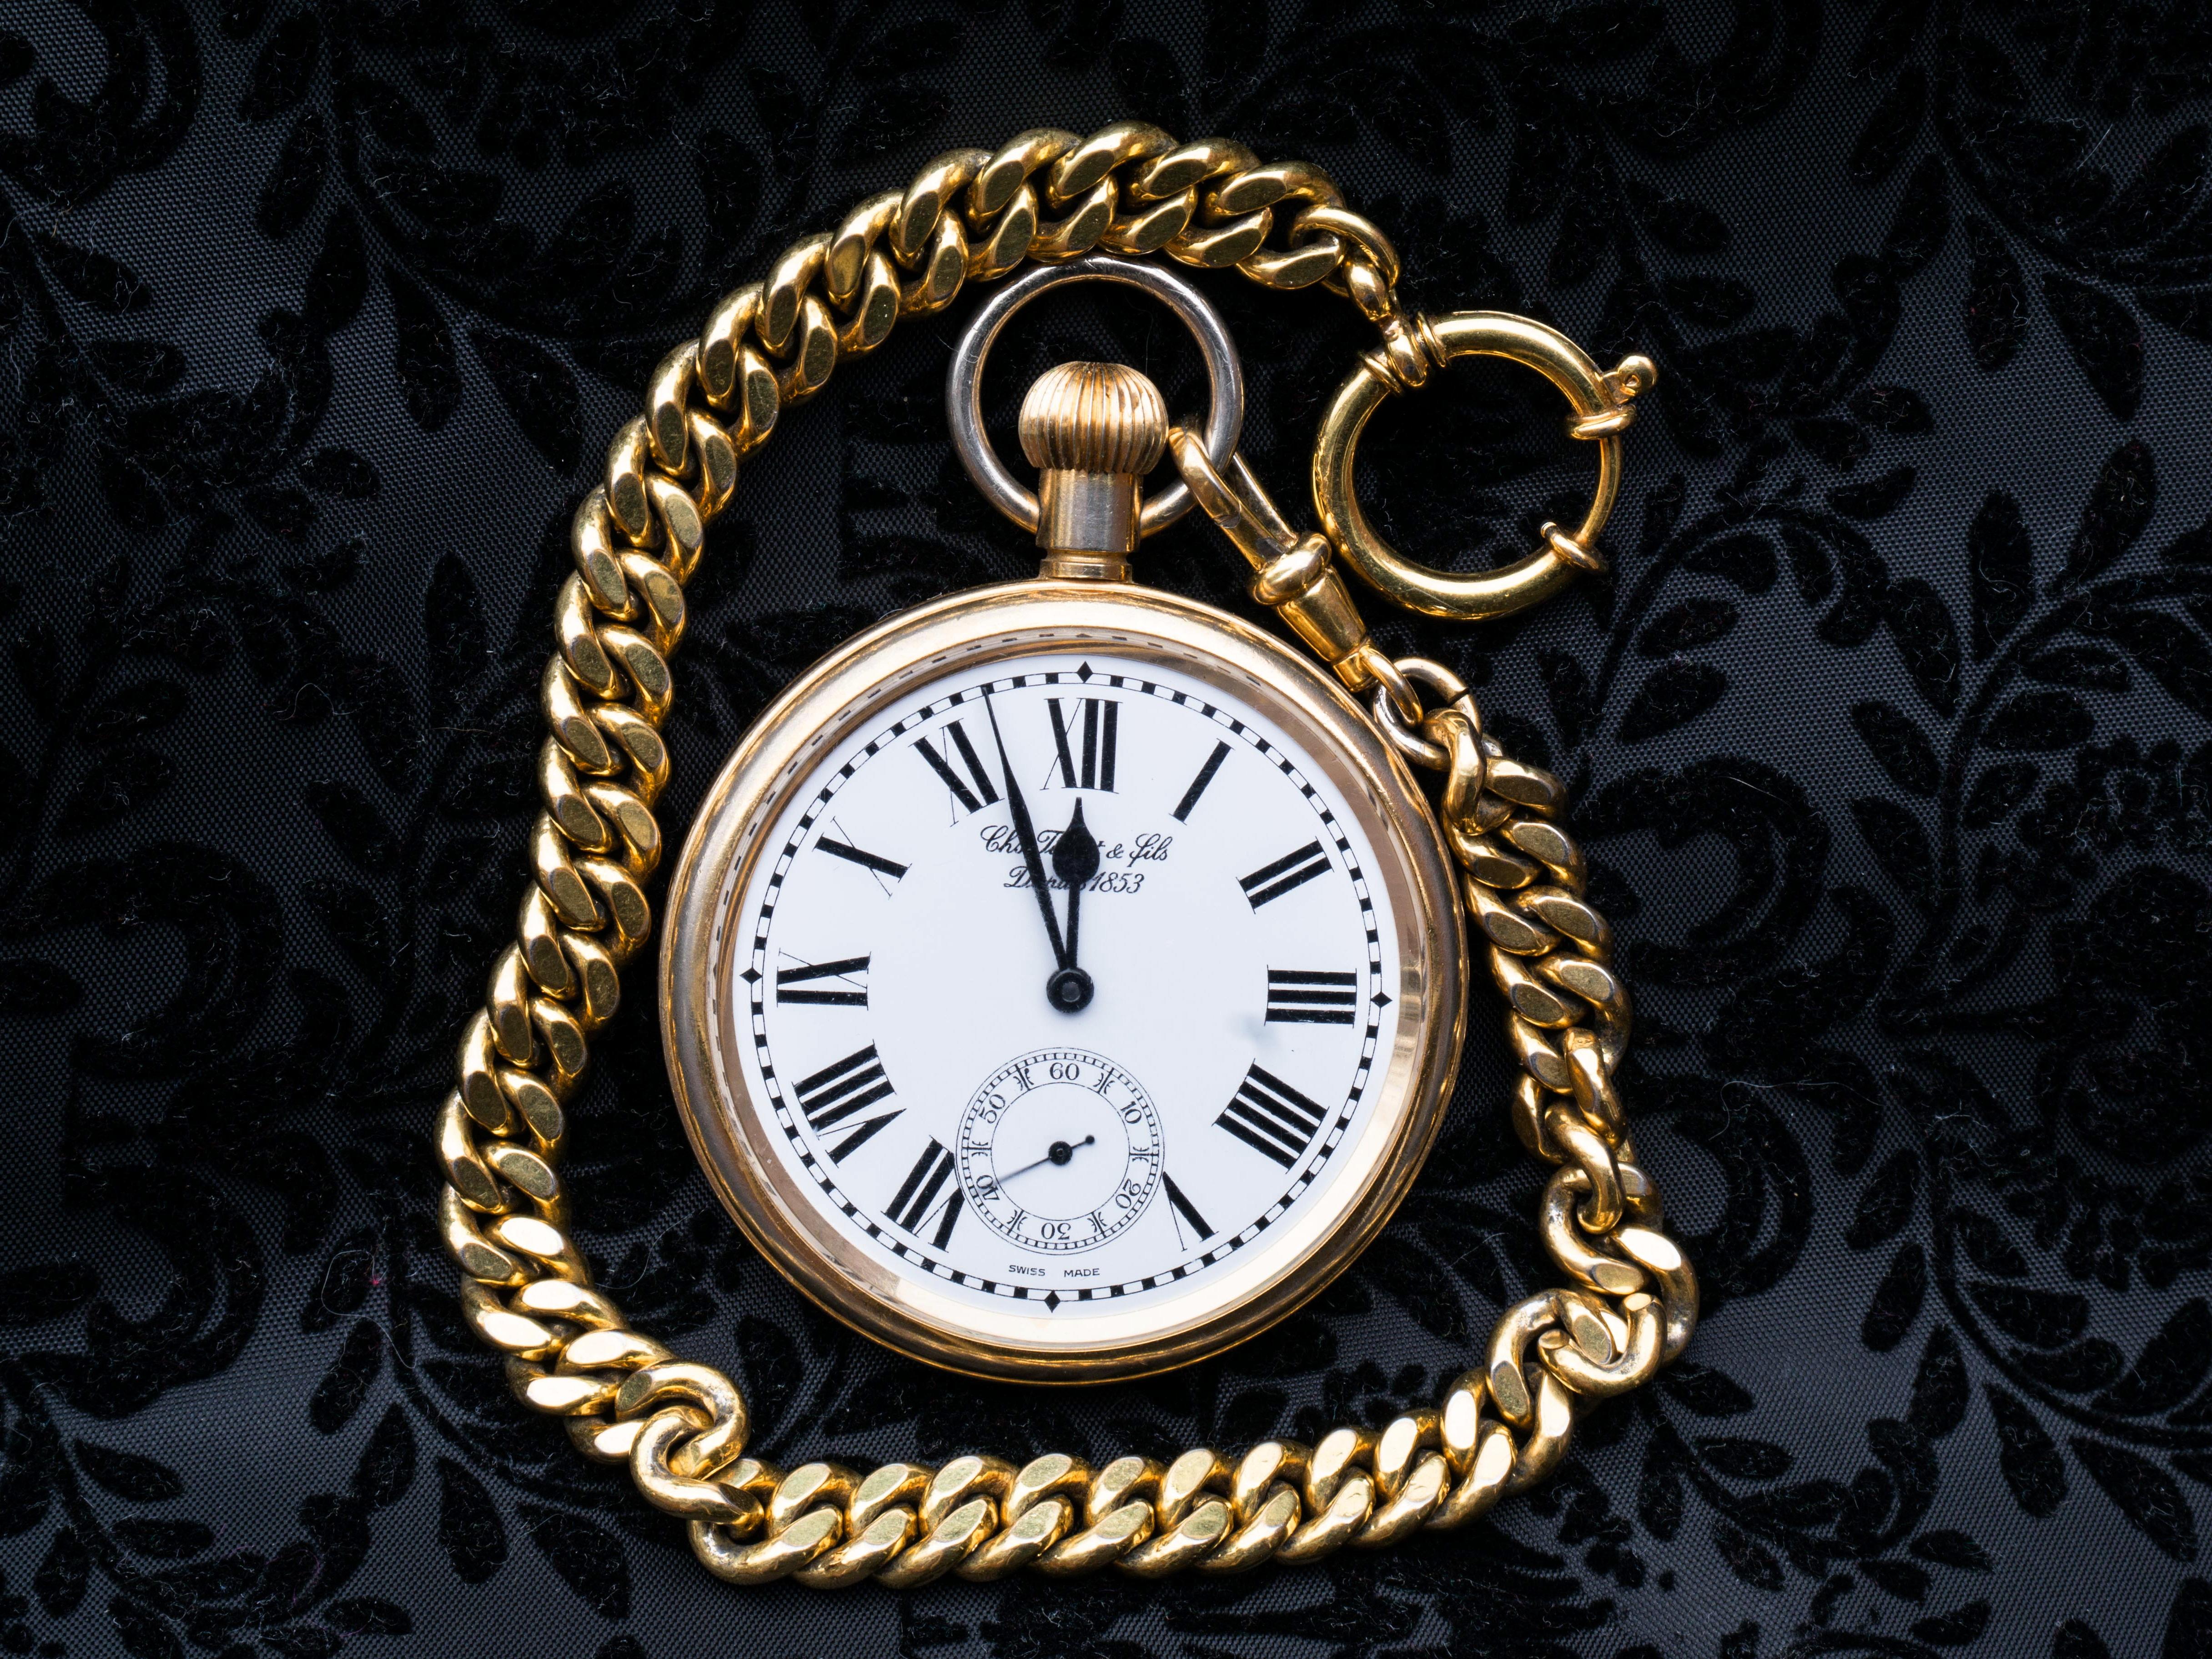 Elgin Gold Watch Fgnb